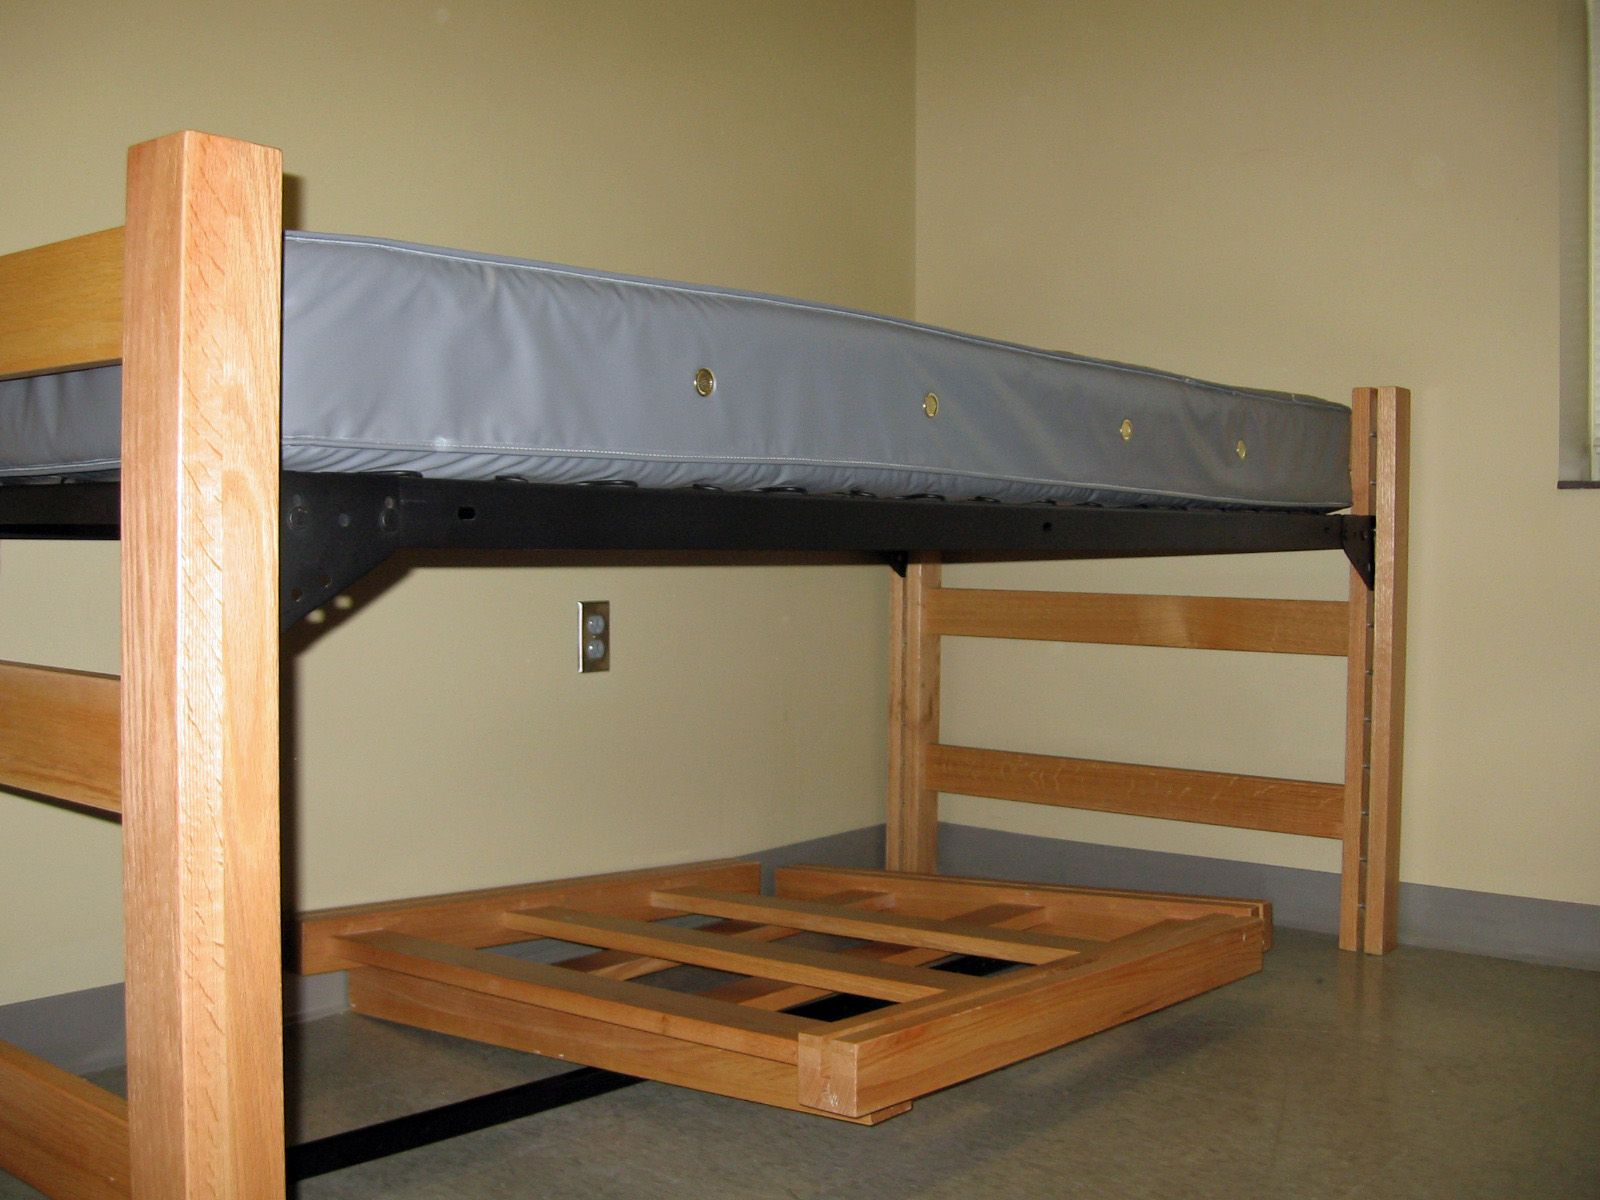 Adjustable Height Dorm Bed Google Search Dorm Bedding Bed